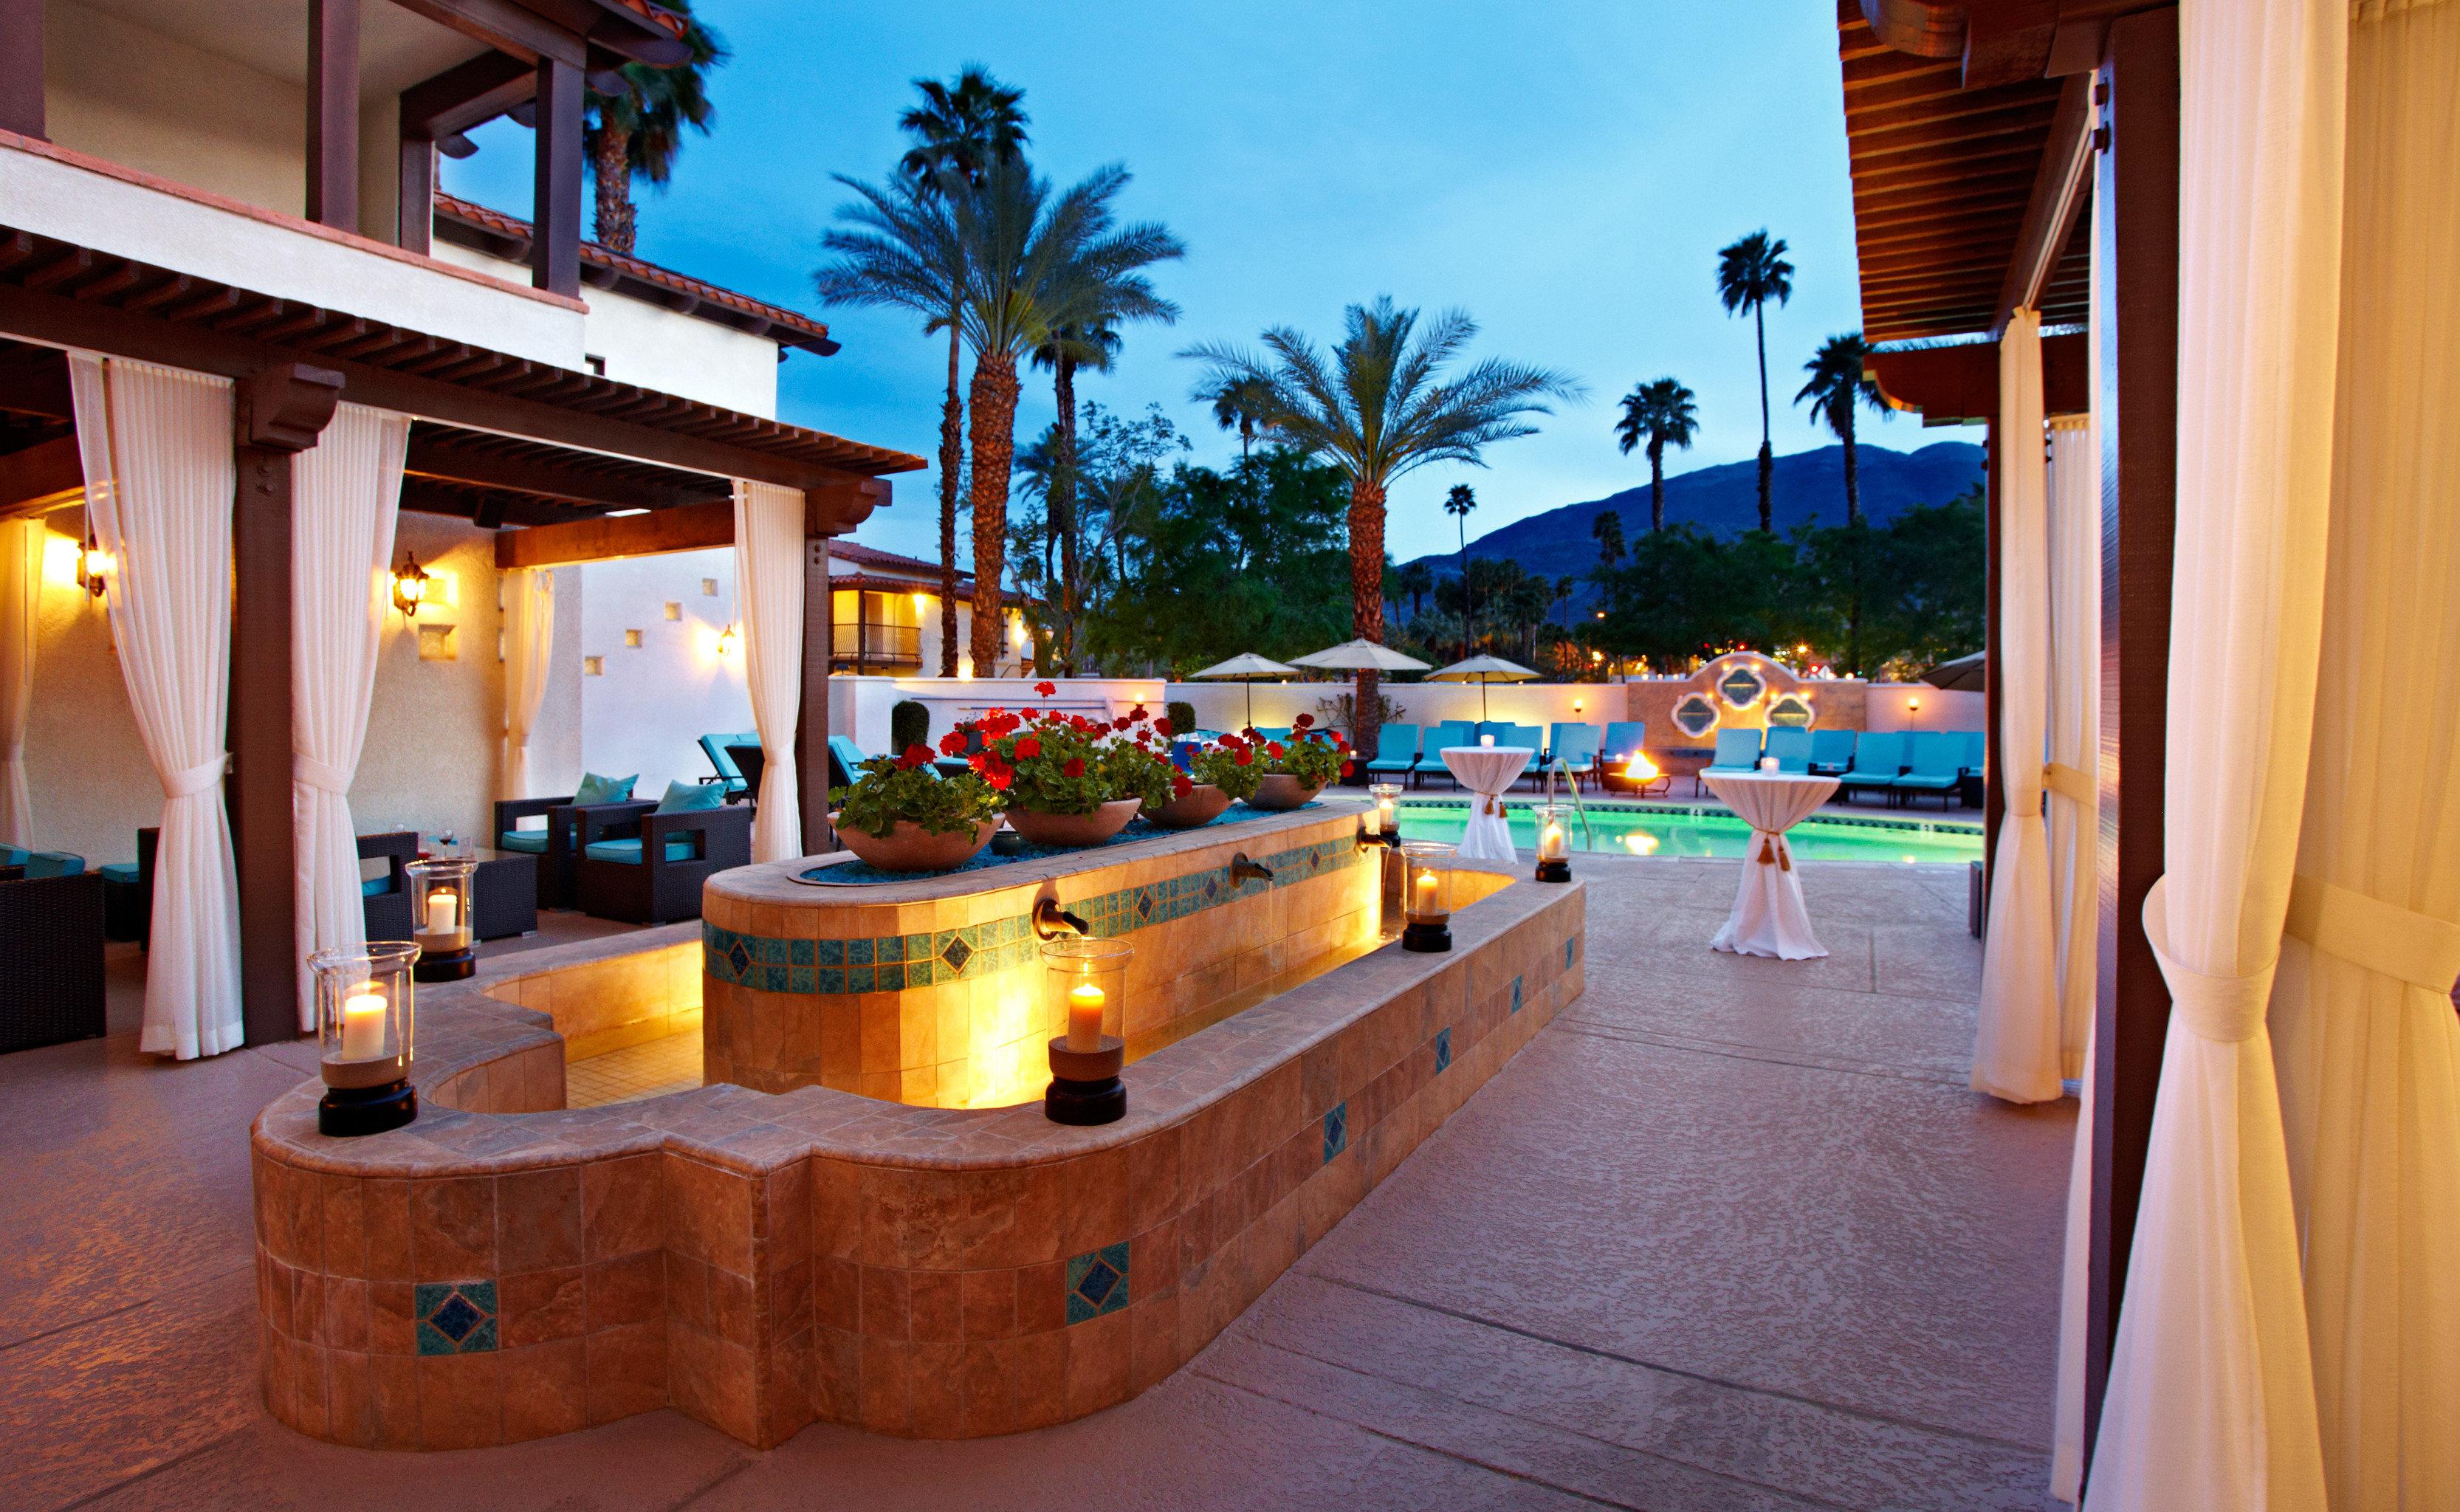 Lounge Luxury Pool leisure property Resort swimming pool home Villa